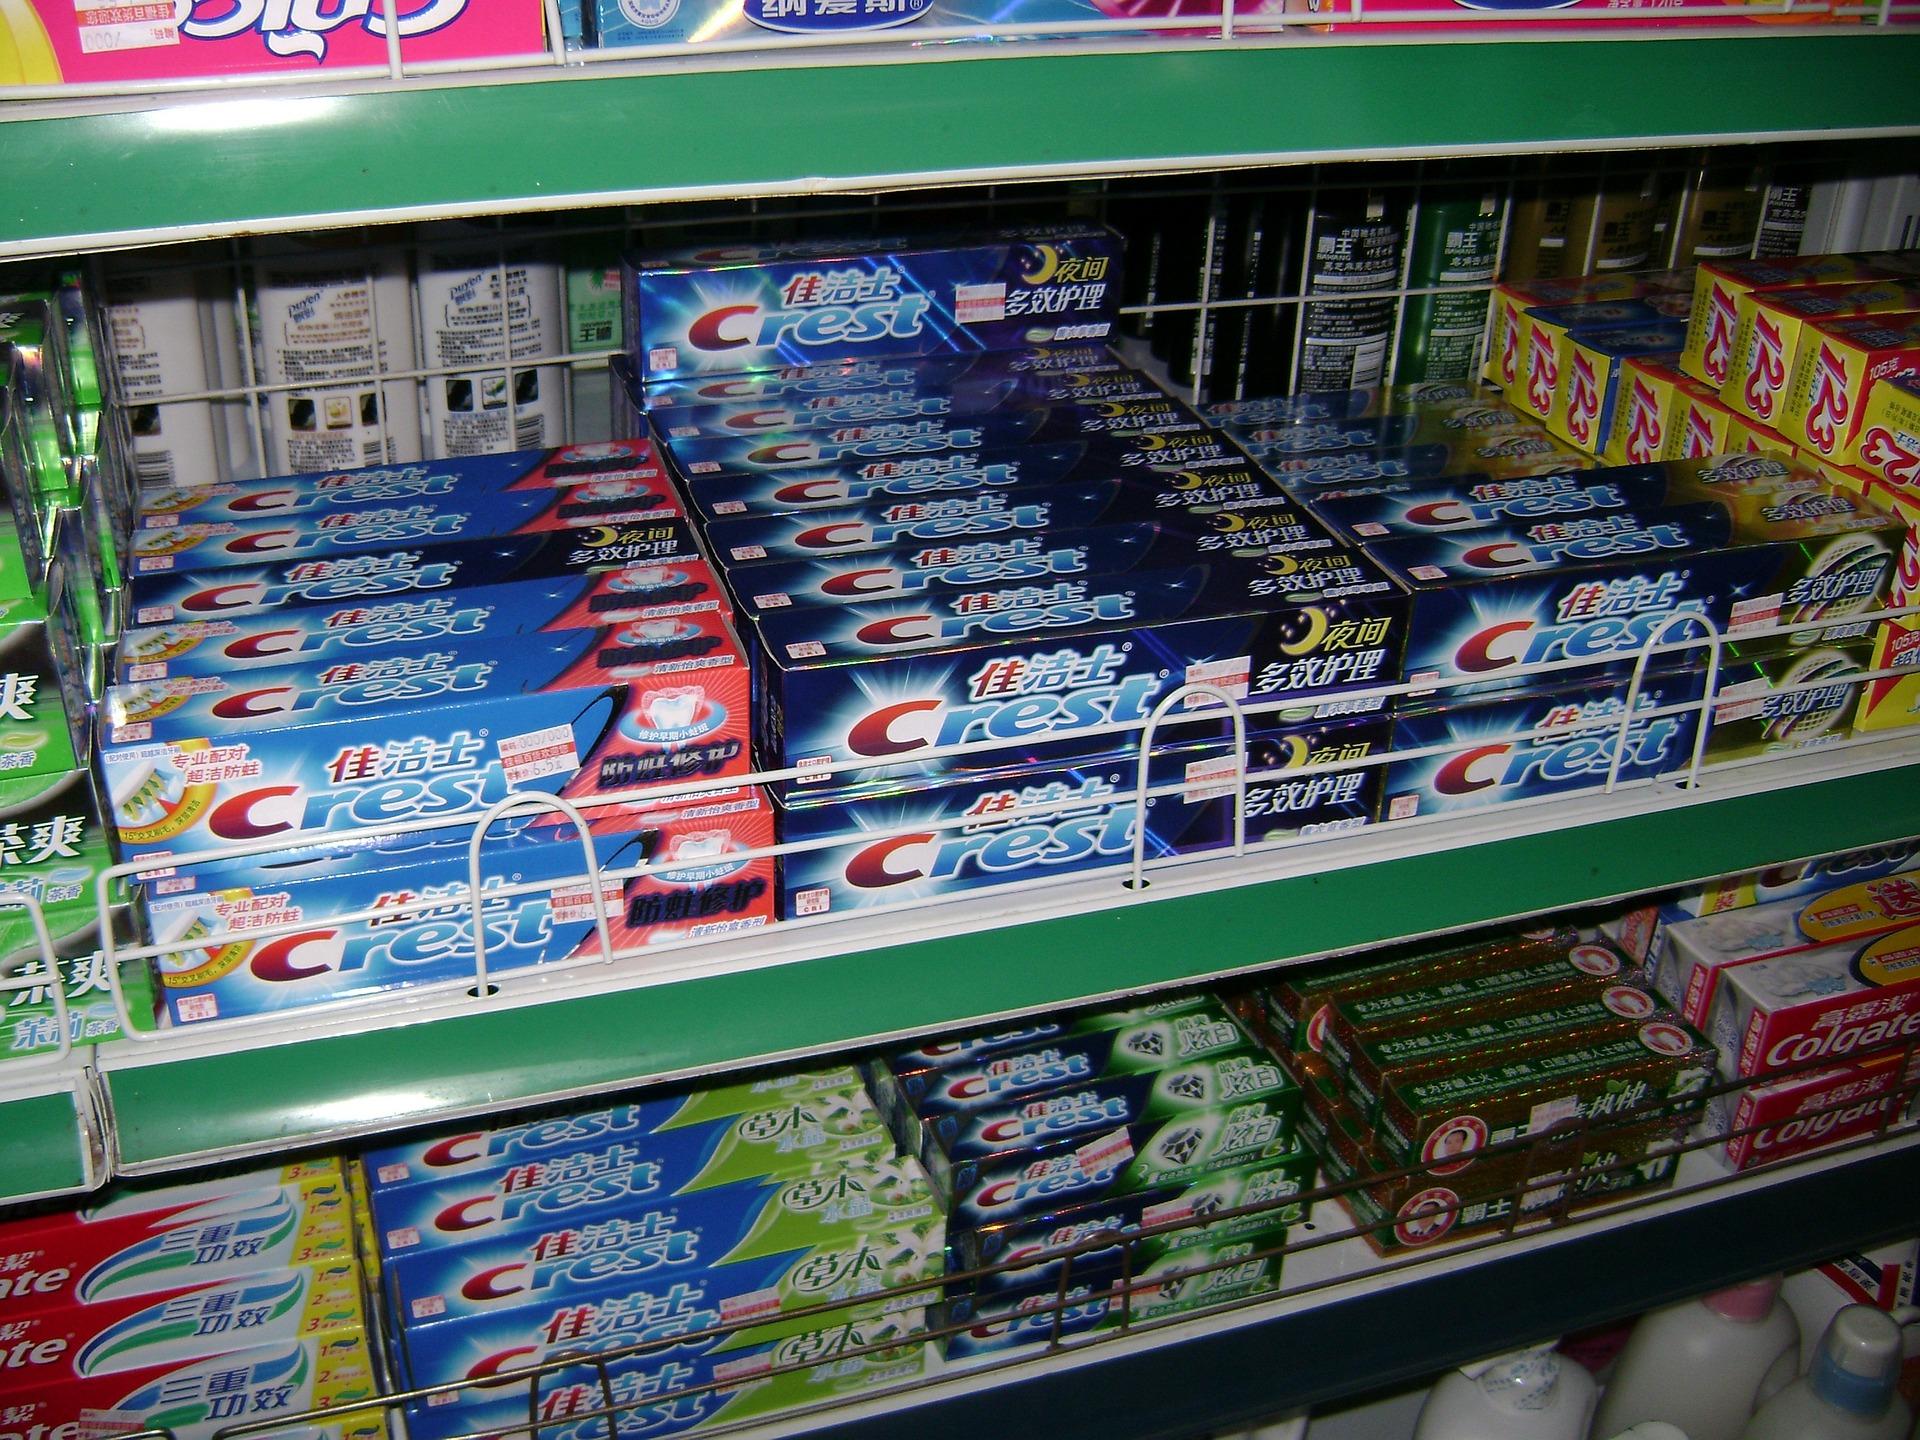 toothpaste-272505_1920